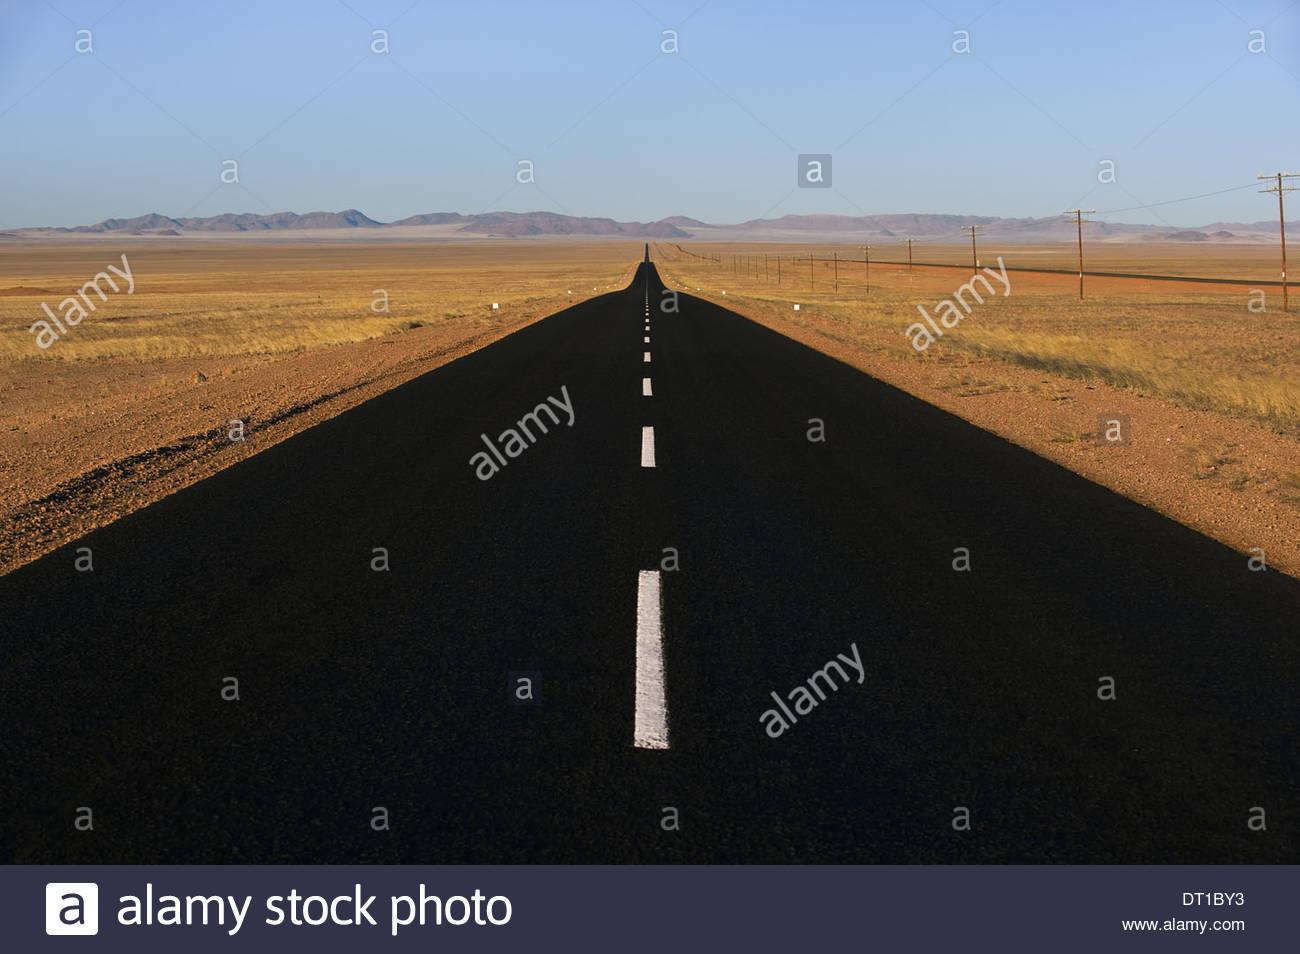 Namibia Tarred road near Luderitz Namibia - Stock Image